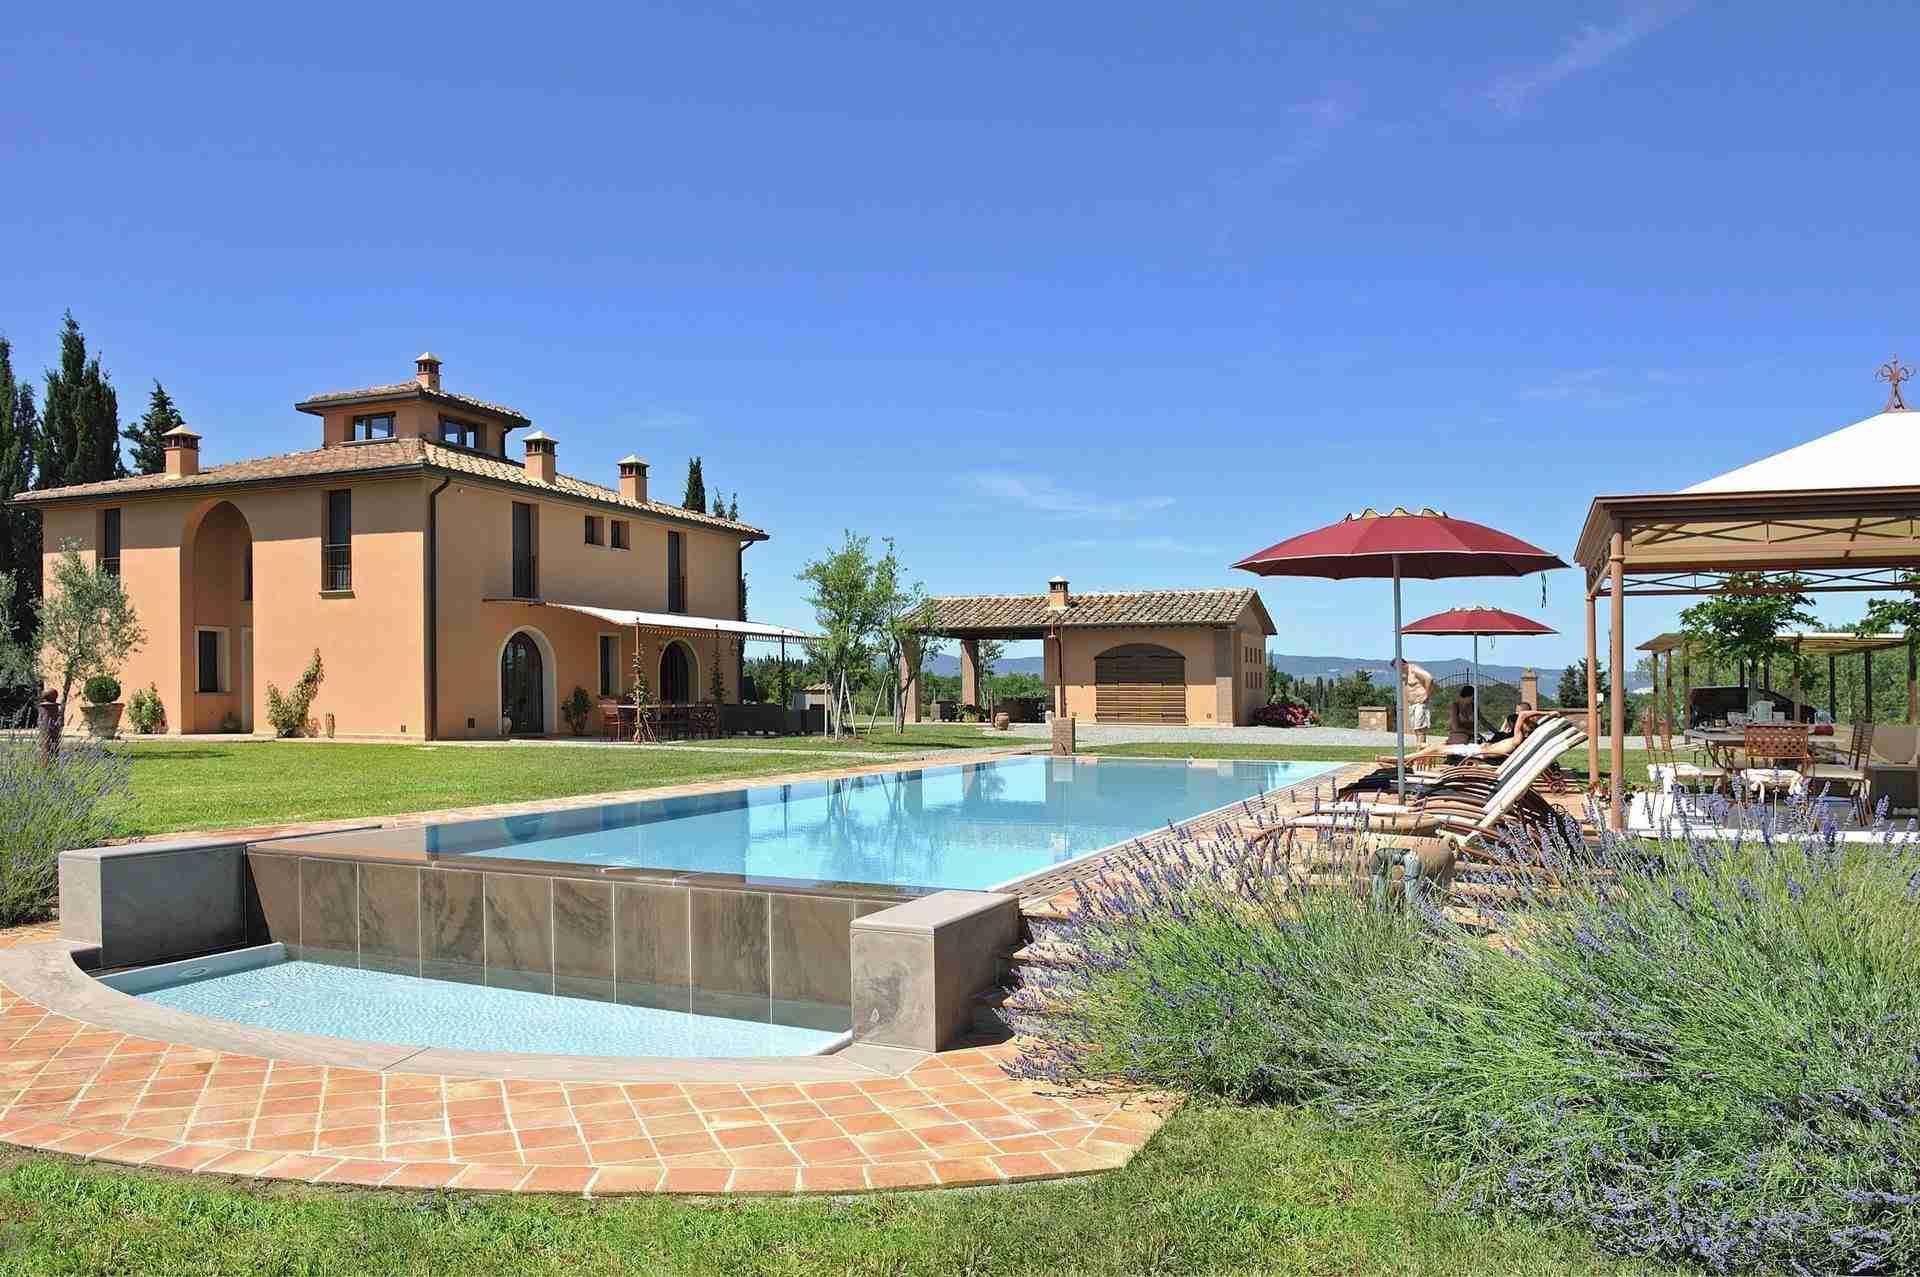 6 Dante Pool and garden